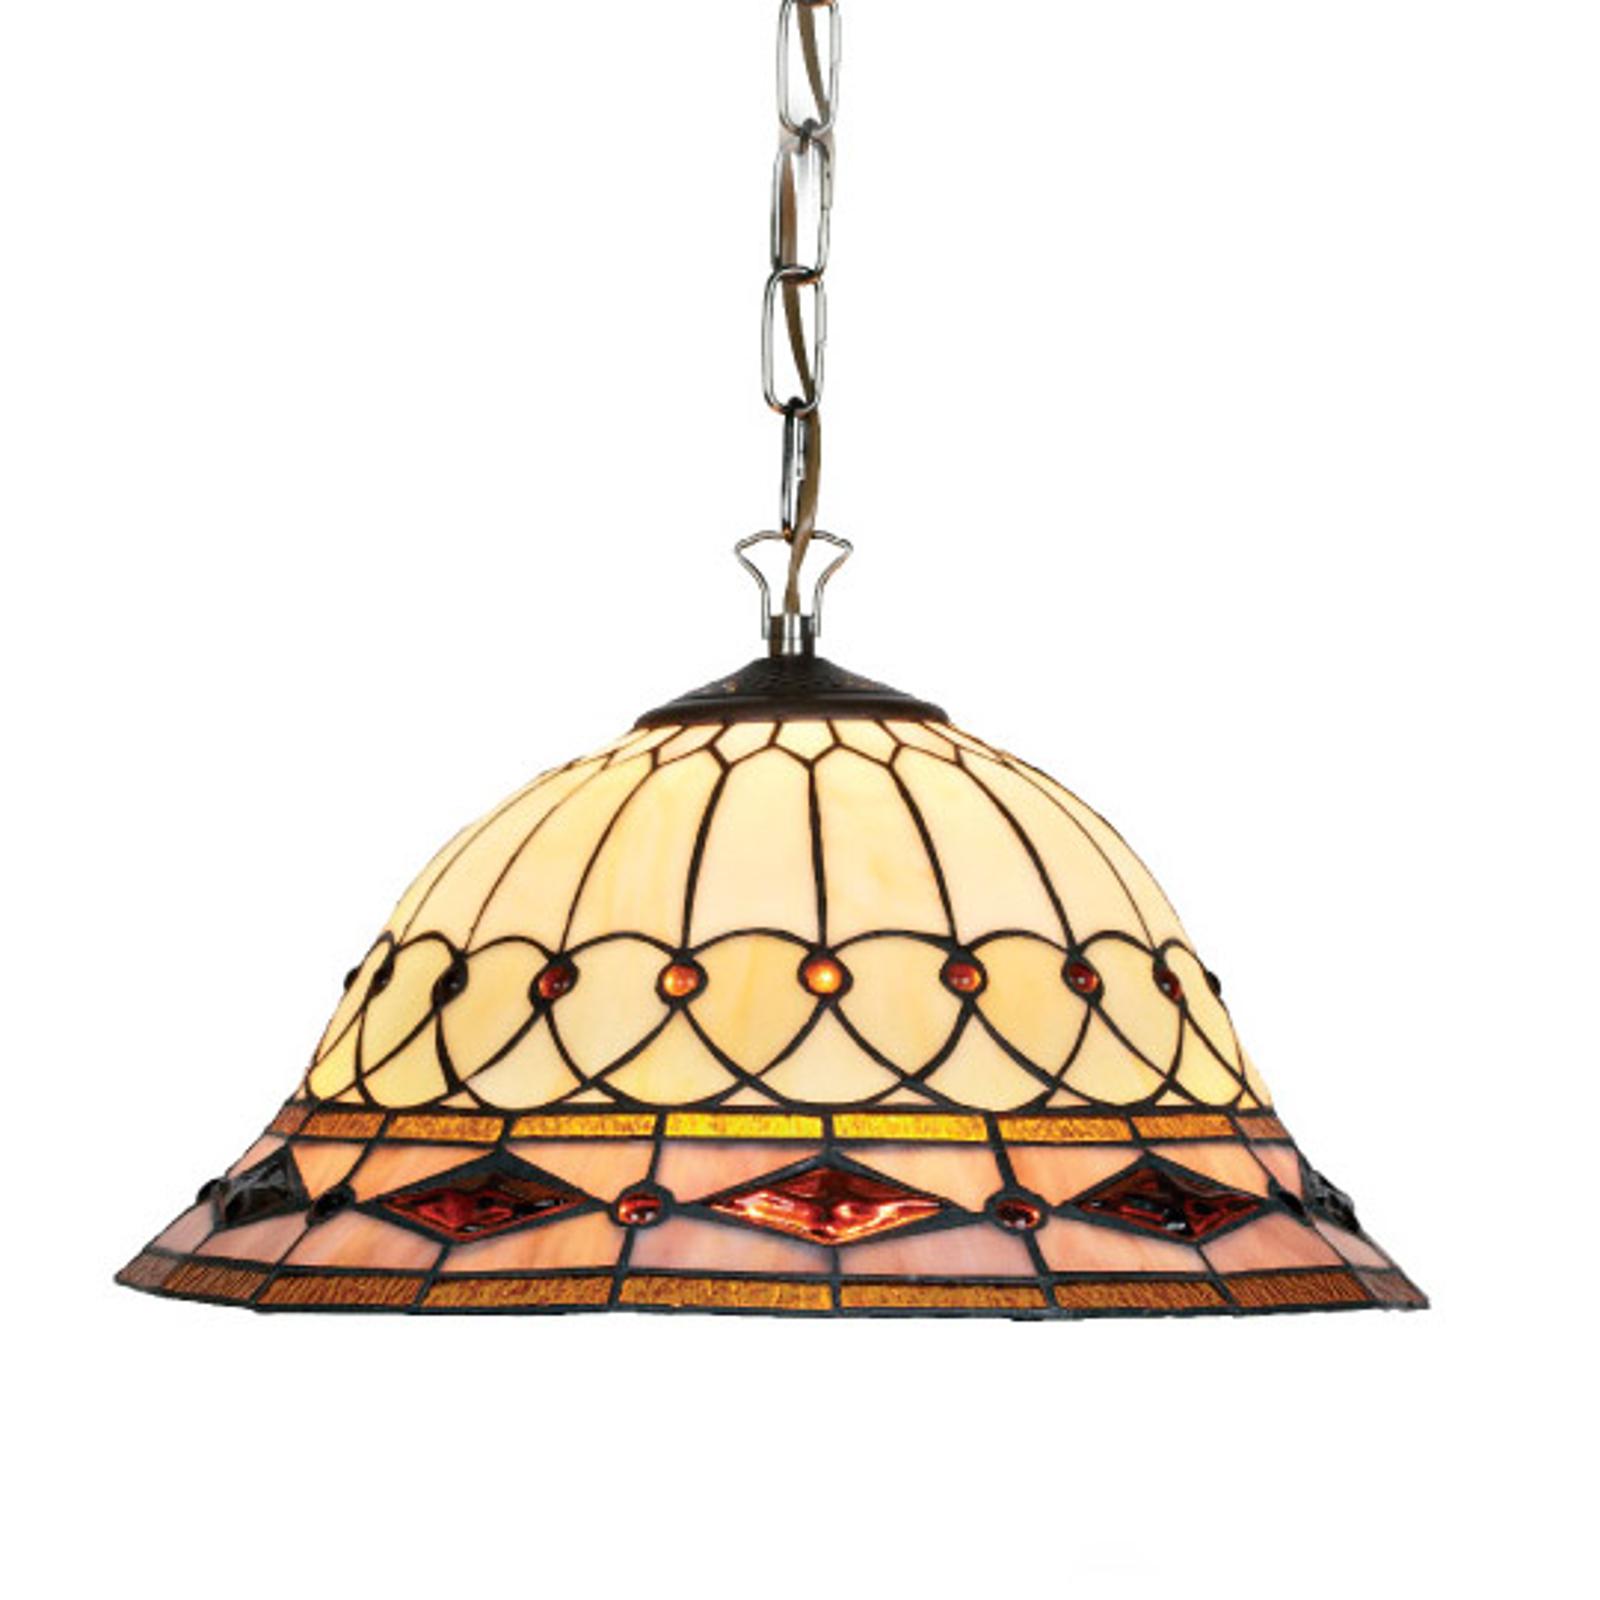 Lampa wisząca Kassandra, styl Tiffany, 2-punktowa